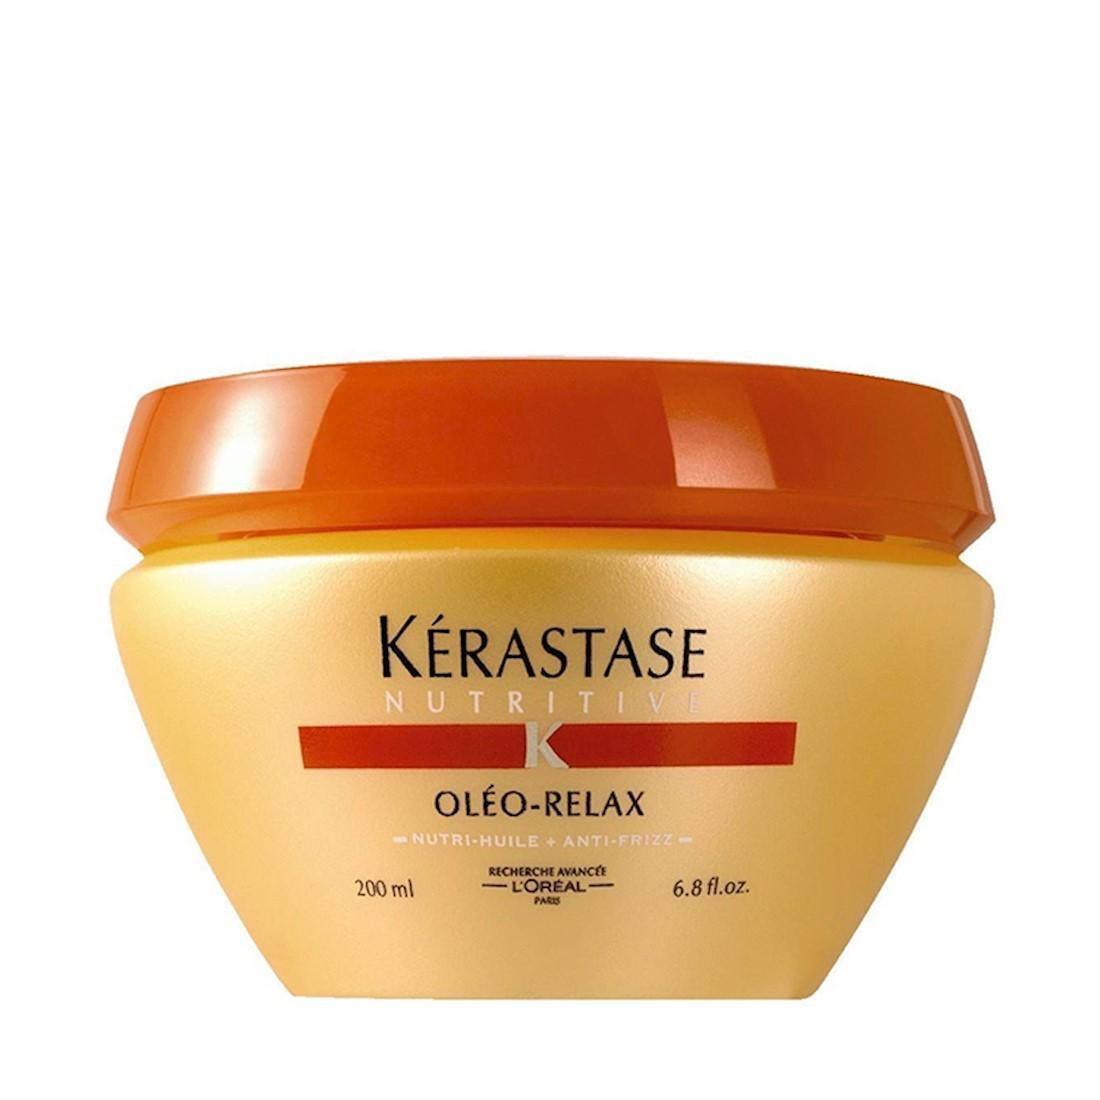 Kérastase Nutritive Oléo-Relax - Máscara Capilar 200ml - CA